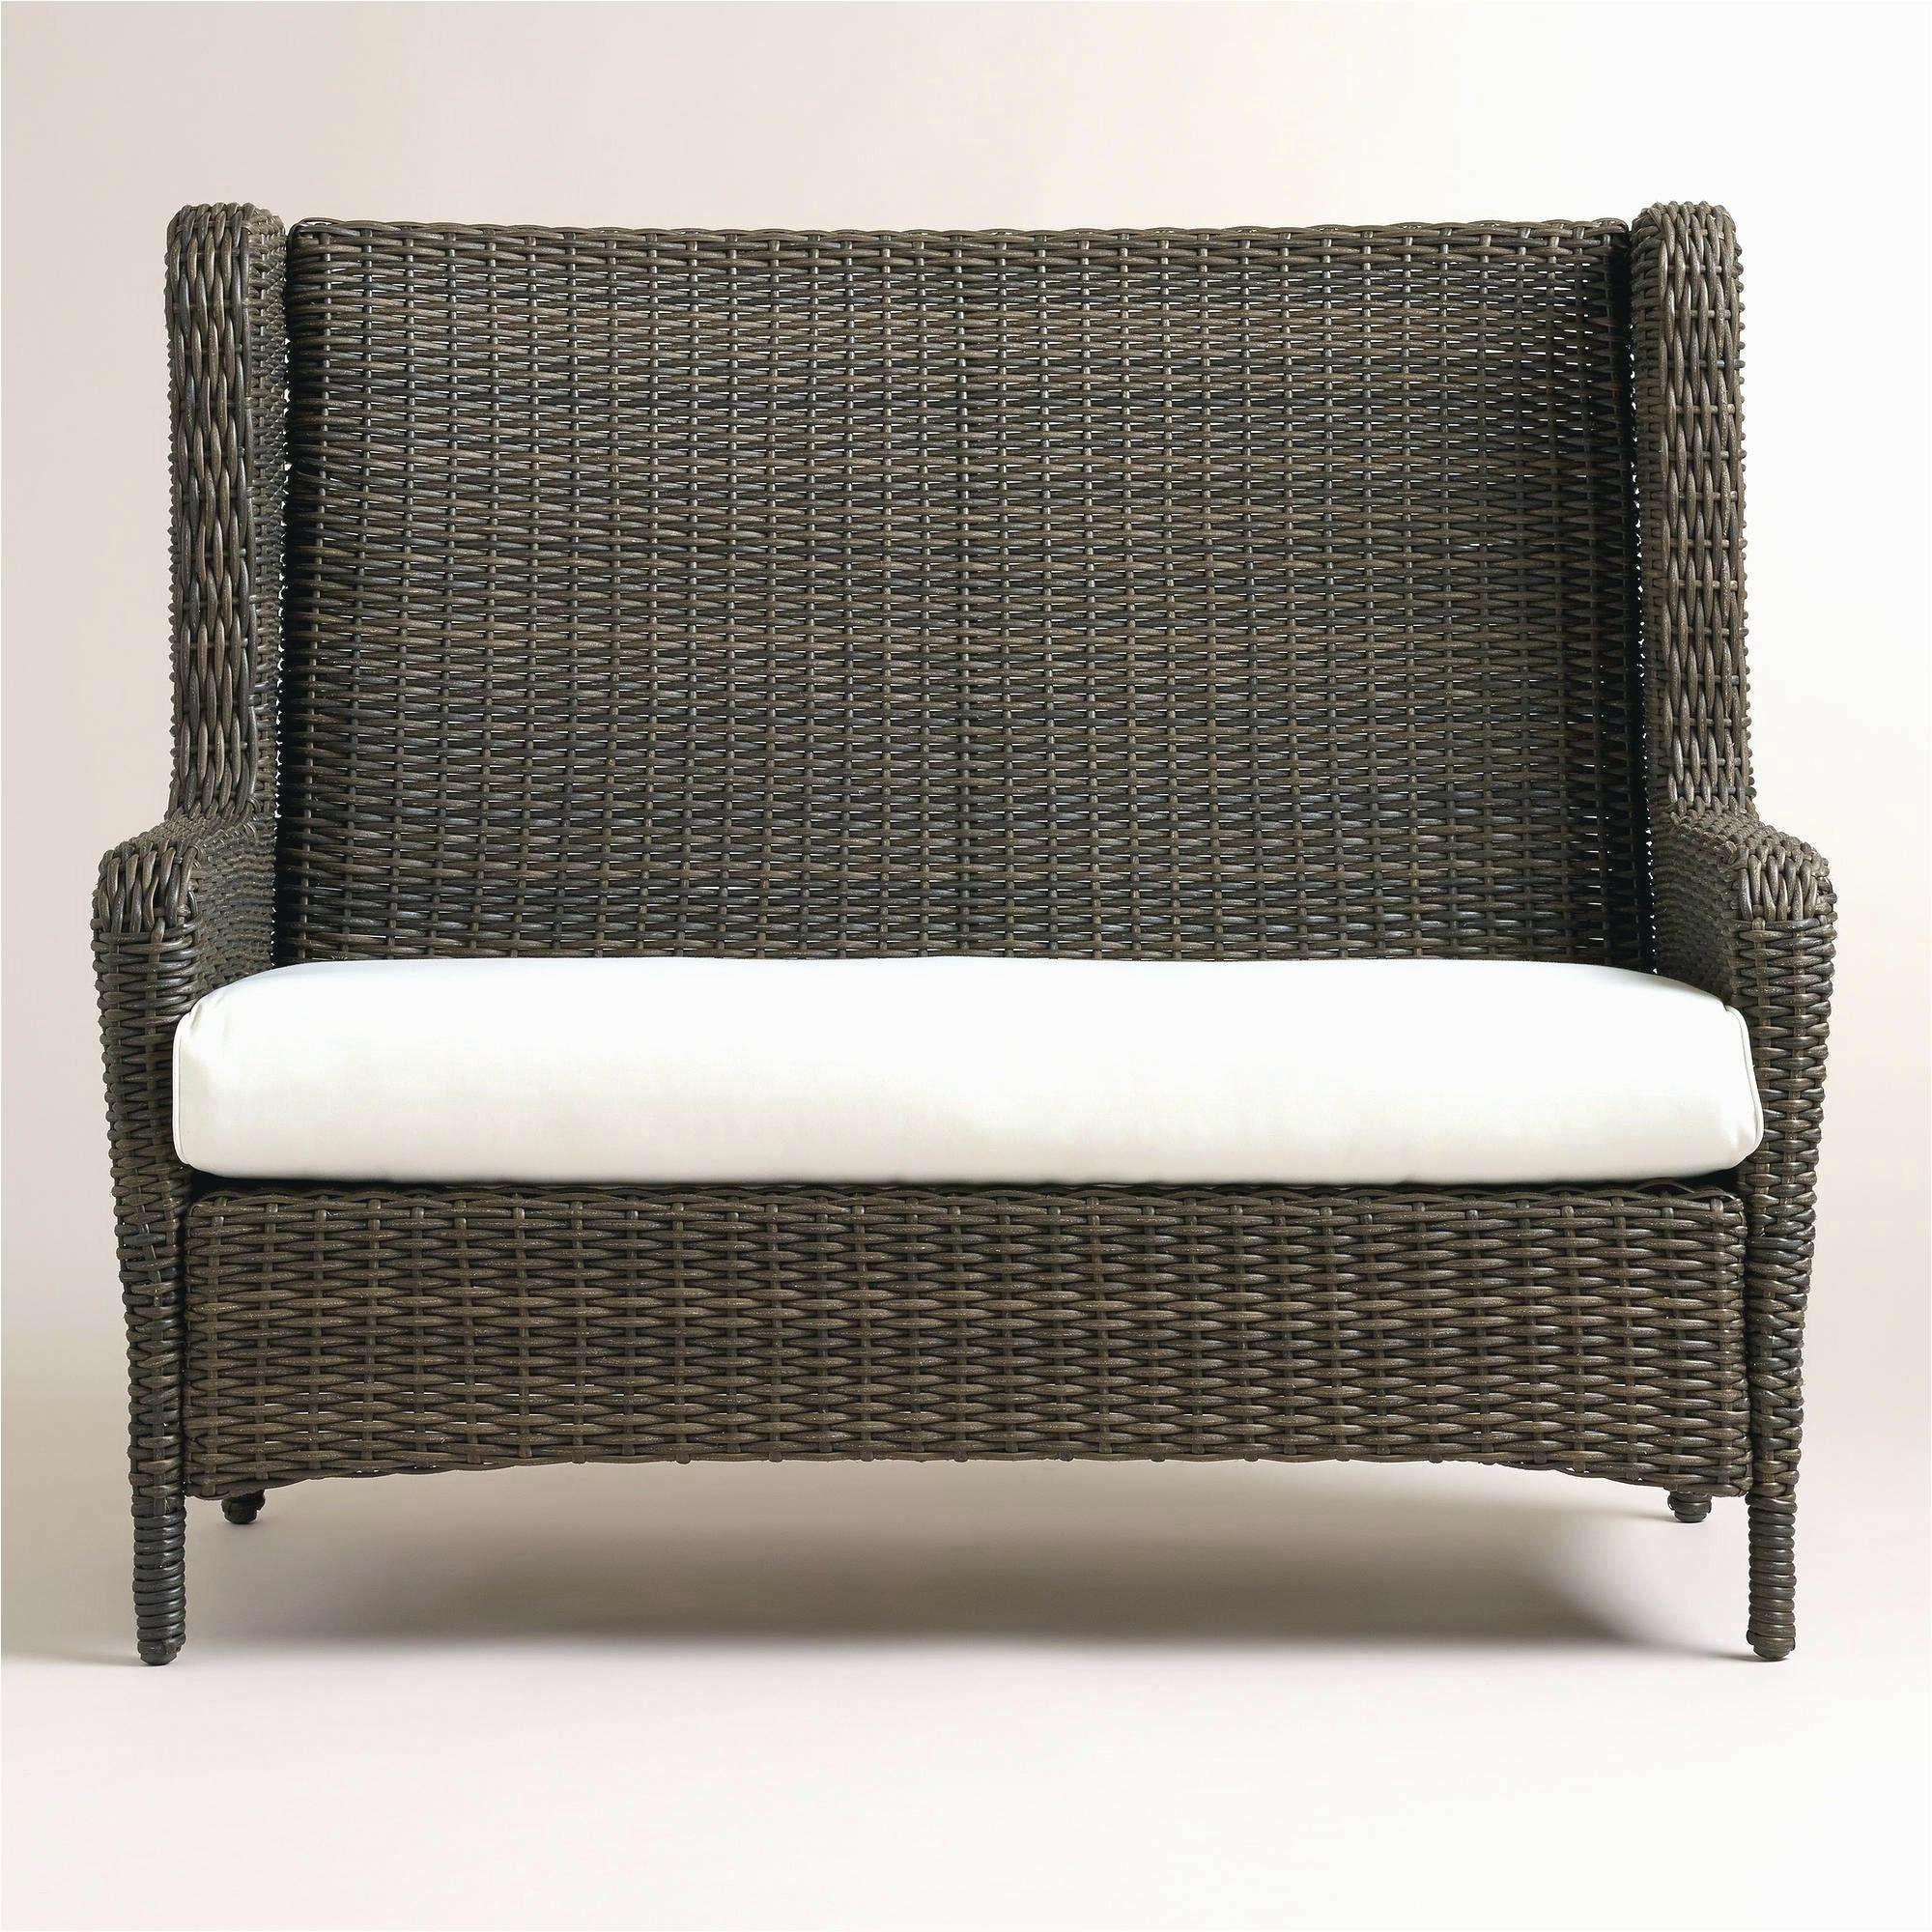 mayfair patio furniture elegant outdoor floor cushions unique wicker outdoor sofa 0d patio chairs